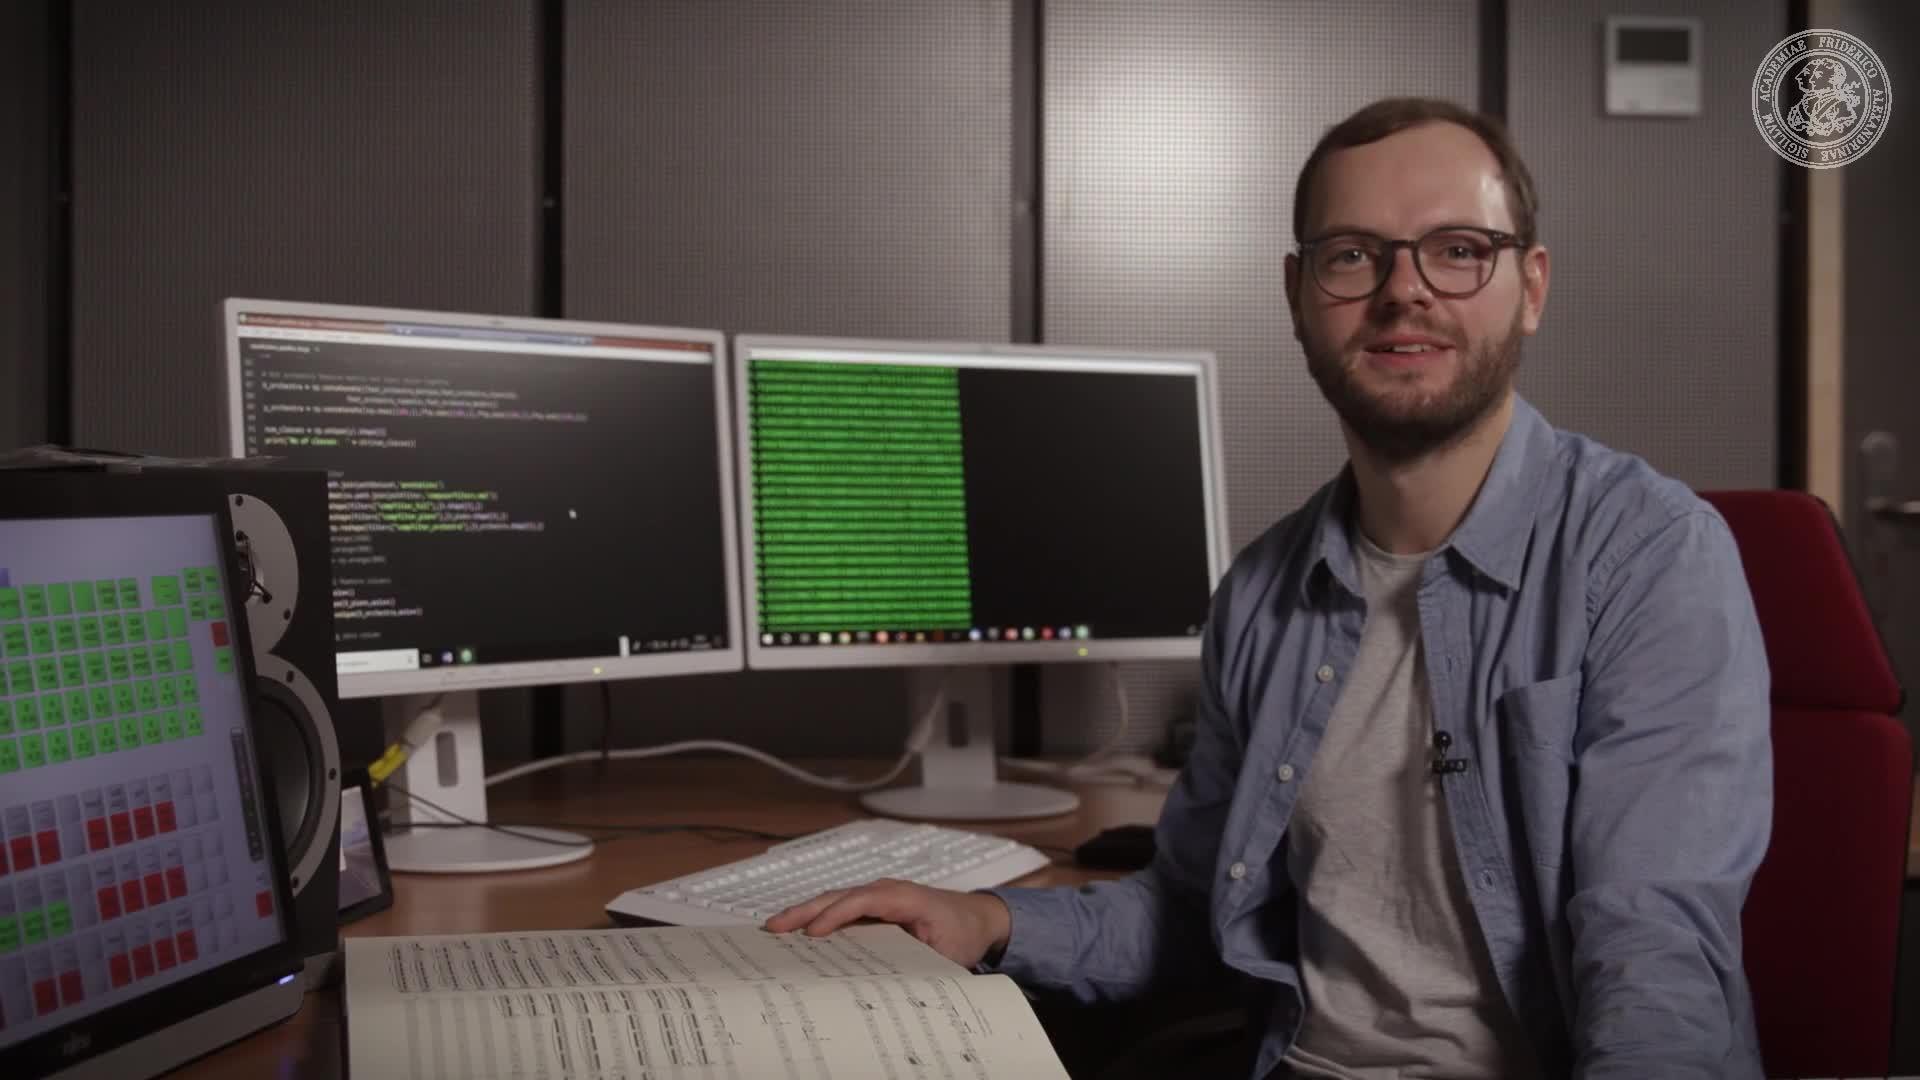 2 Minuten Wissen - Können Computer hören? preview image